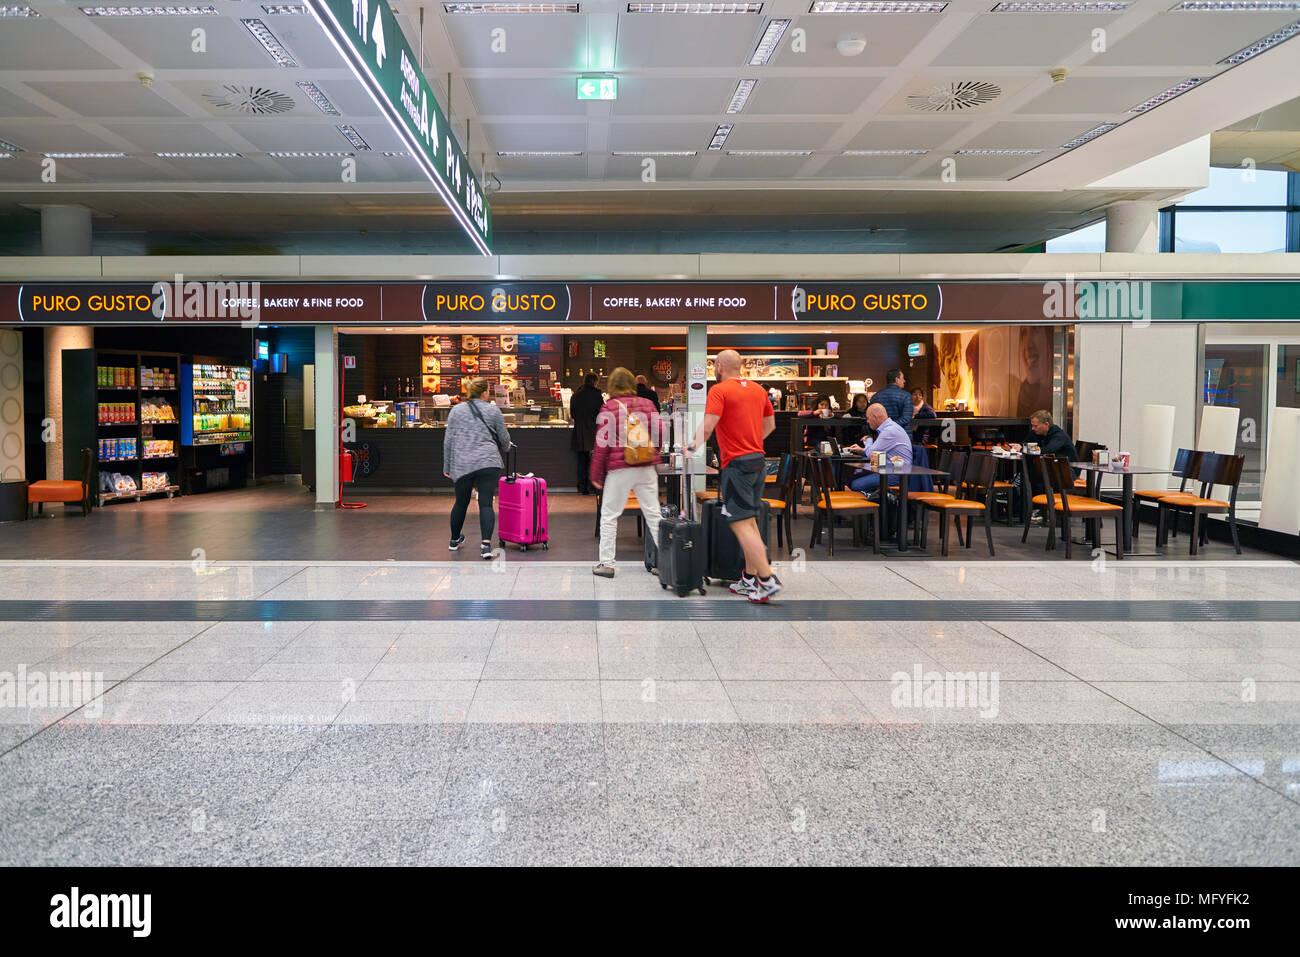 MILAN MALPENSA, ITALY - CIRCA NOVEMBER, 2017: Puro Gusto at Milan-Malpensa airport. - Stock Image